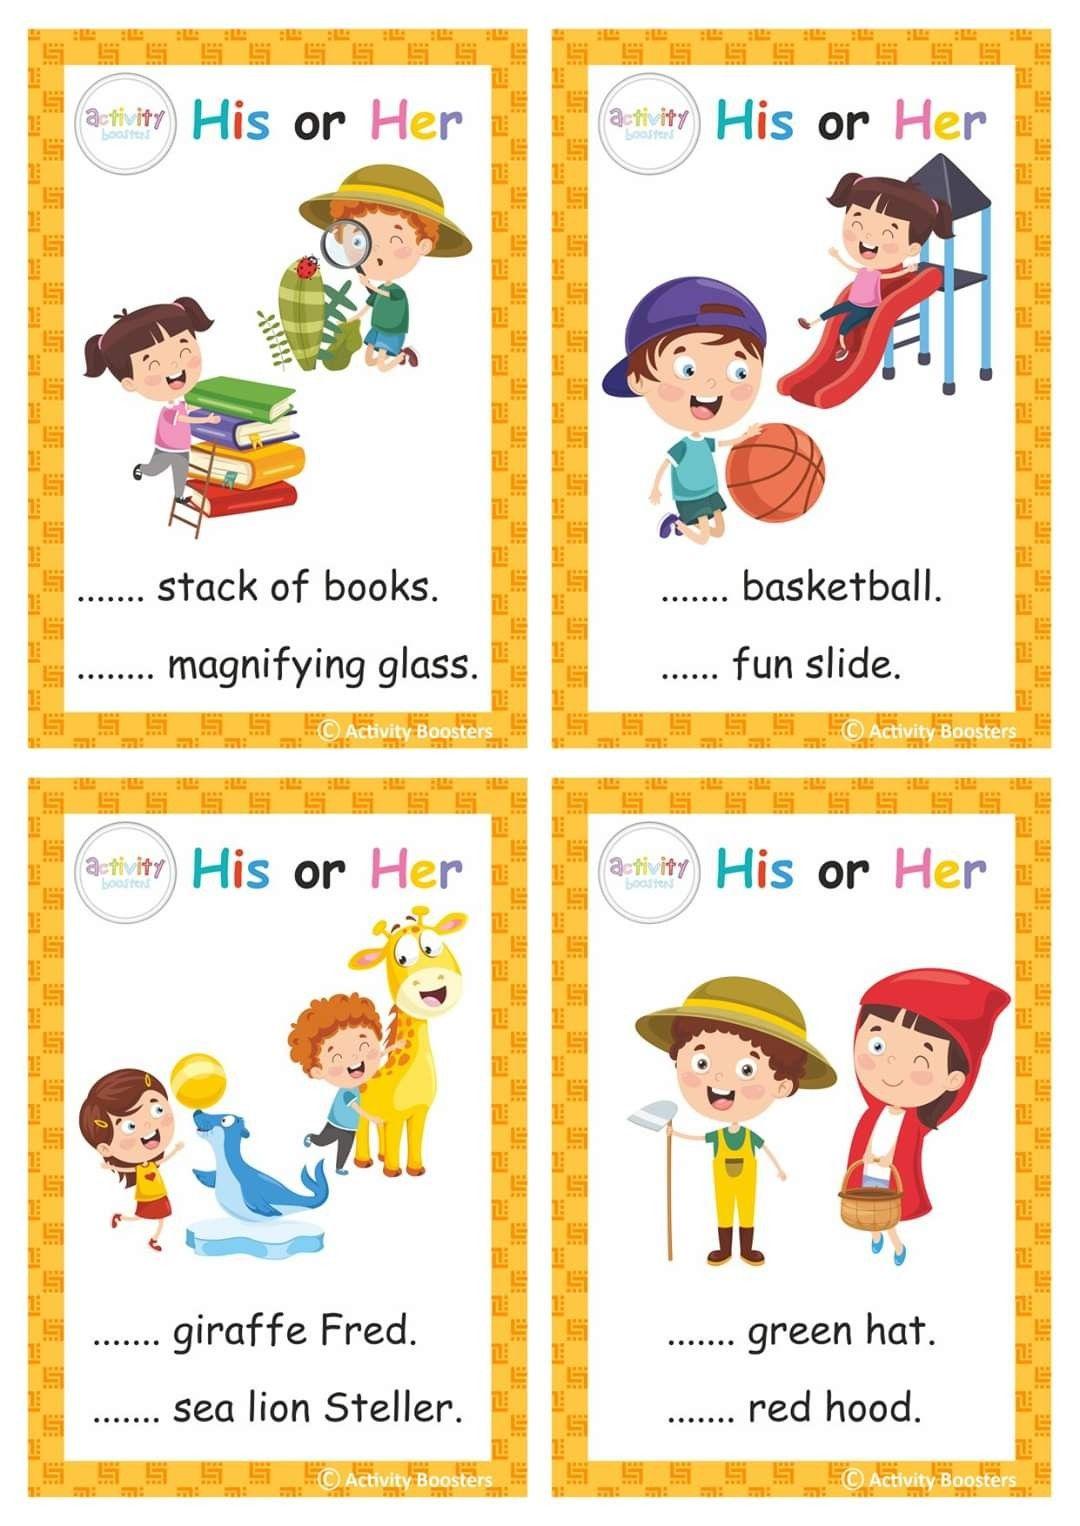 Pin By Natasha On Phrasal Verbs Vocab And Grammar English Grammar For Kids Learning English For Kids English Learning Books [ 1526 x 1080 Pixel ]